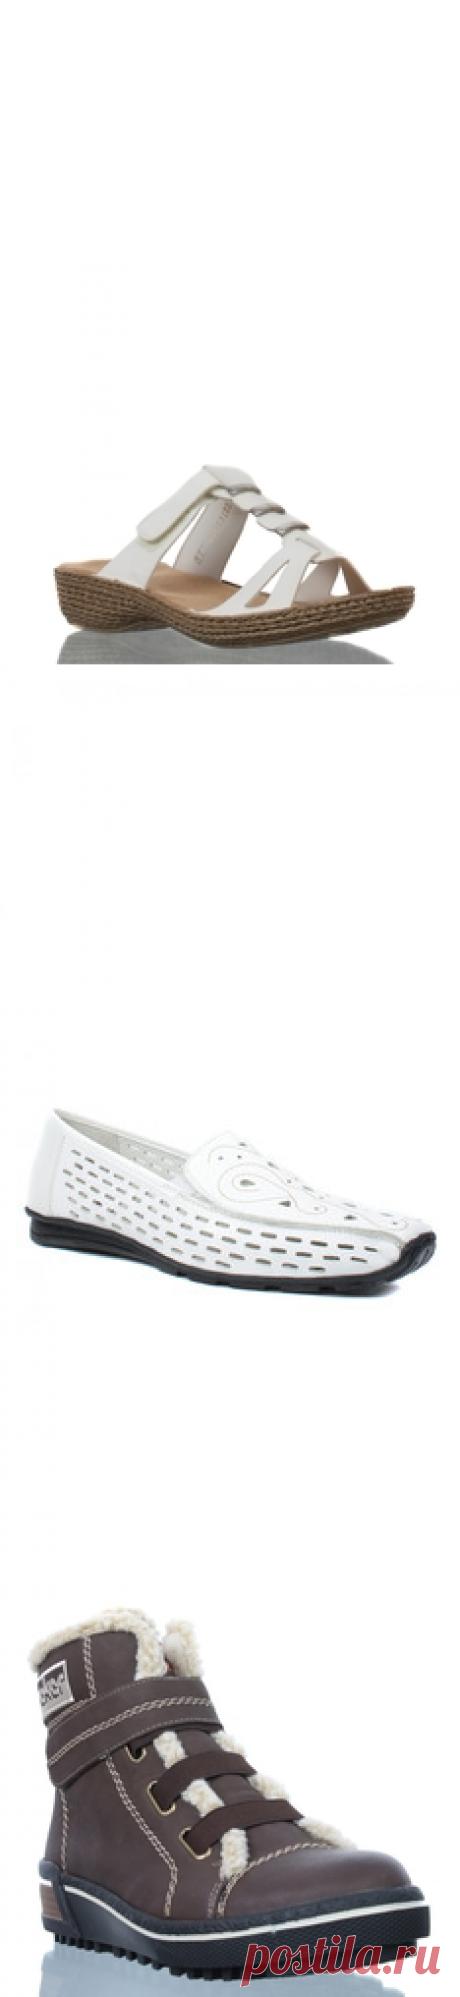 3e1c25c81 Каталог обуви Рикер (Rieker) в интернет магазине KC-Shoes! | доска ...